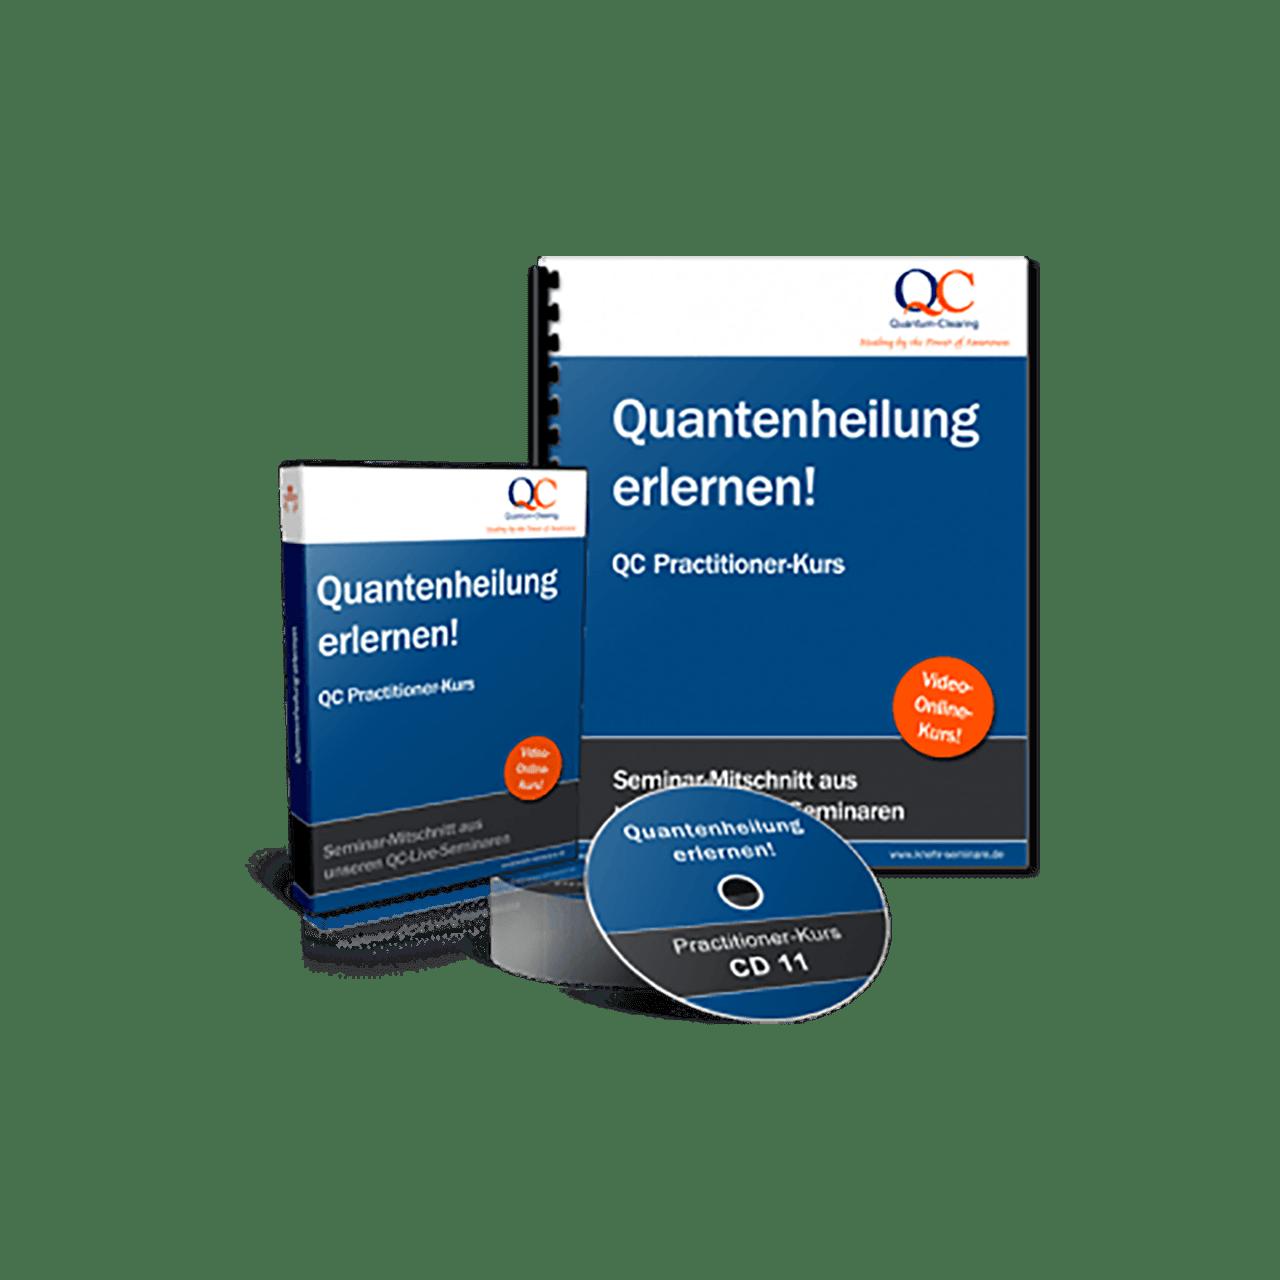 QC-Practitioner